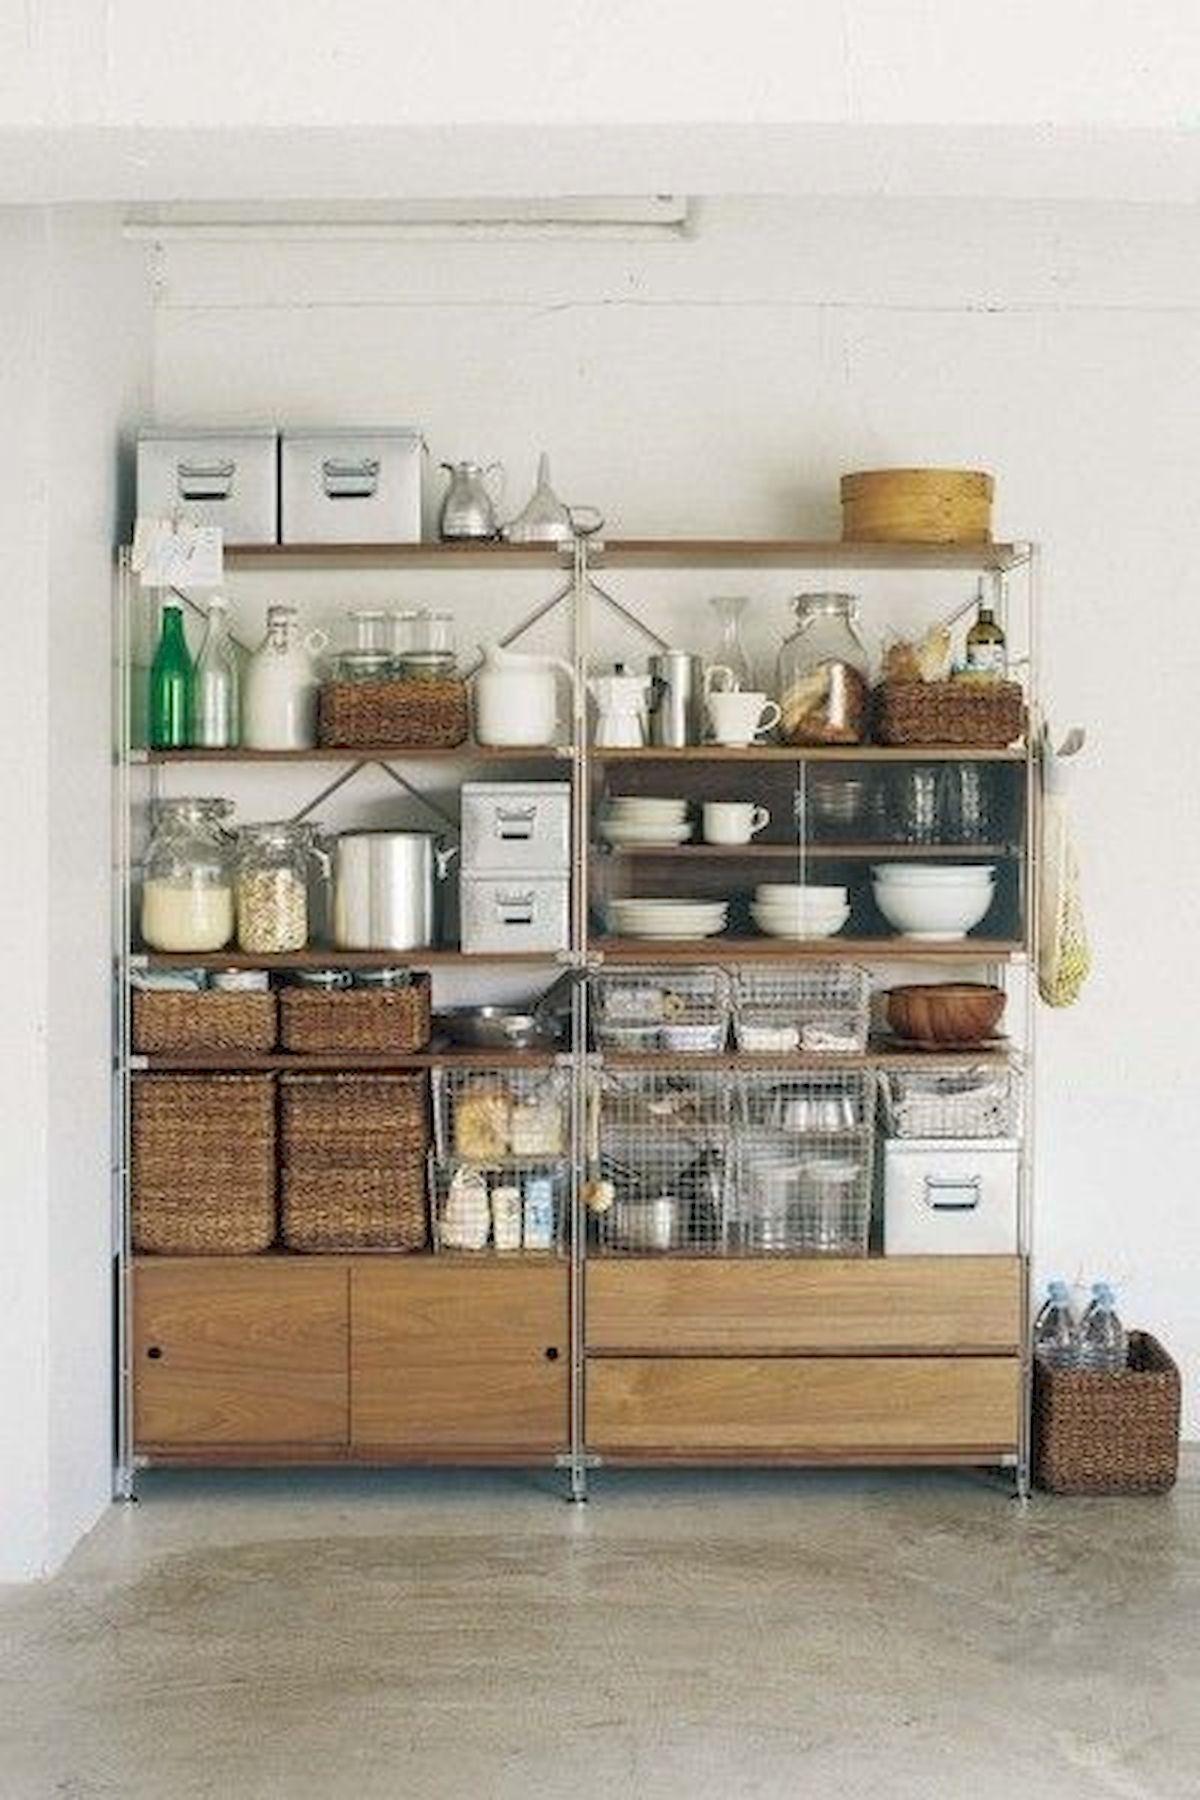 Home Decor おしゃれまとめの人気アイデア Pinterest Chieko Kobayashi 無印 ユニットシェルフ キッチン 無印良品 収納 キッチン 無印キッチン収納